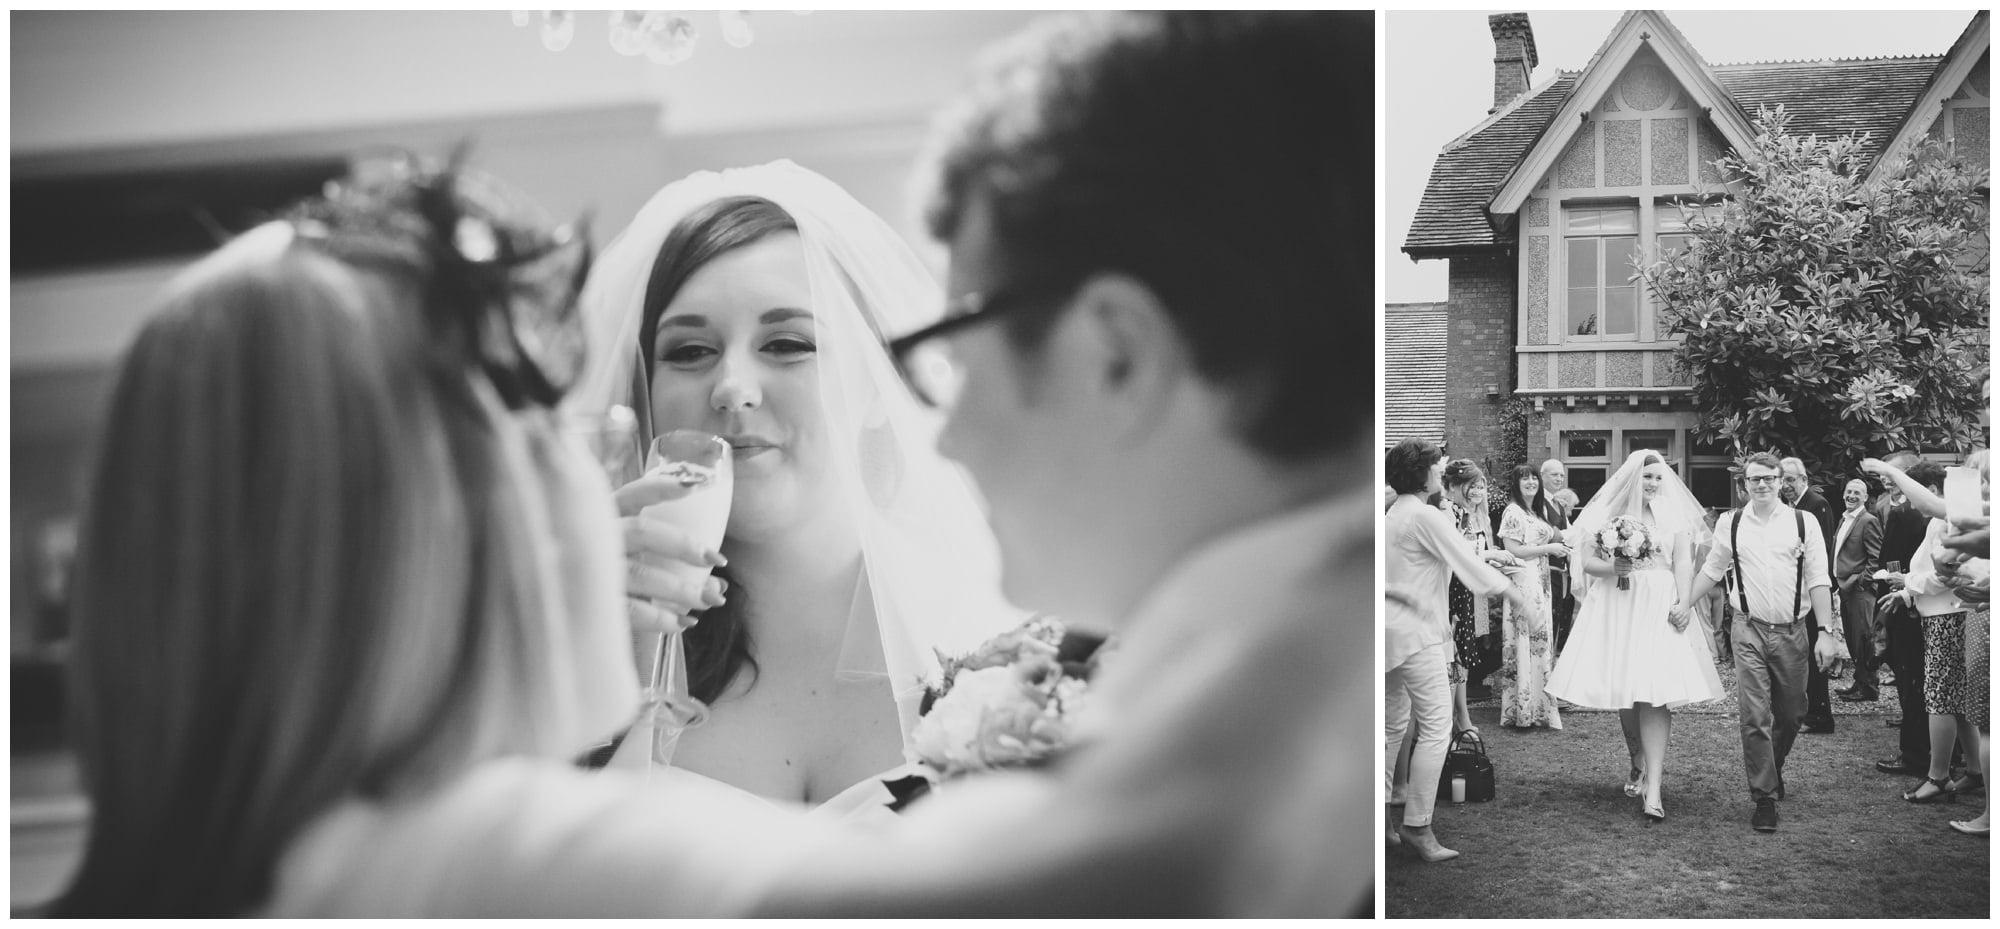 Weddings at The Old Vicarage Hinton